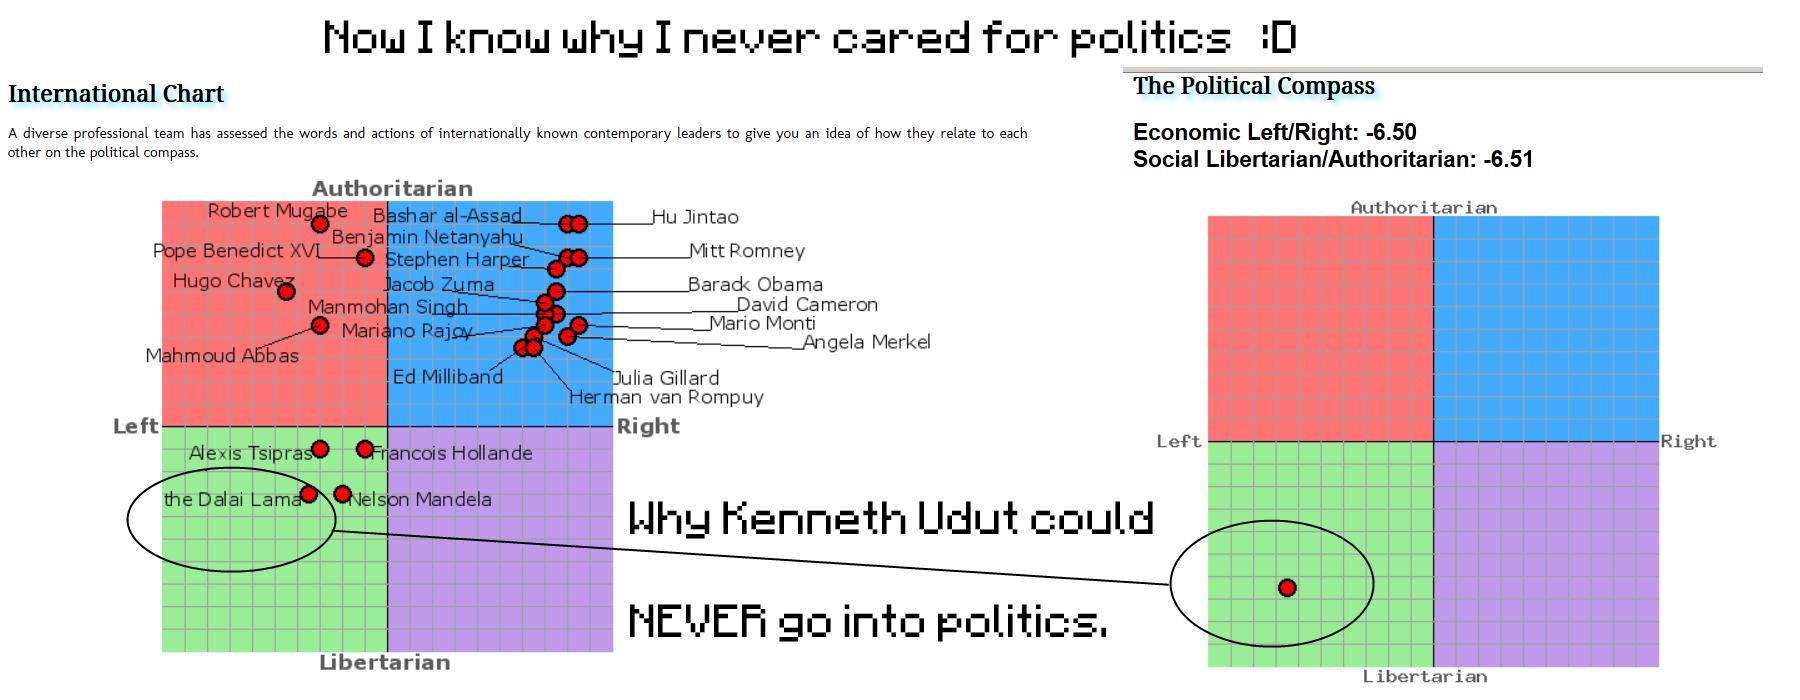 kenneth_udut_politics_dalai-lama